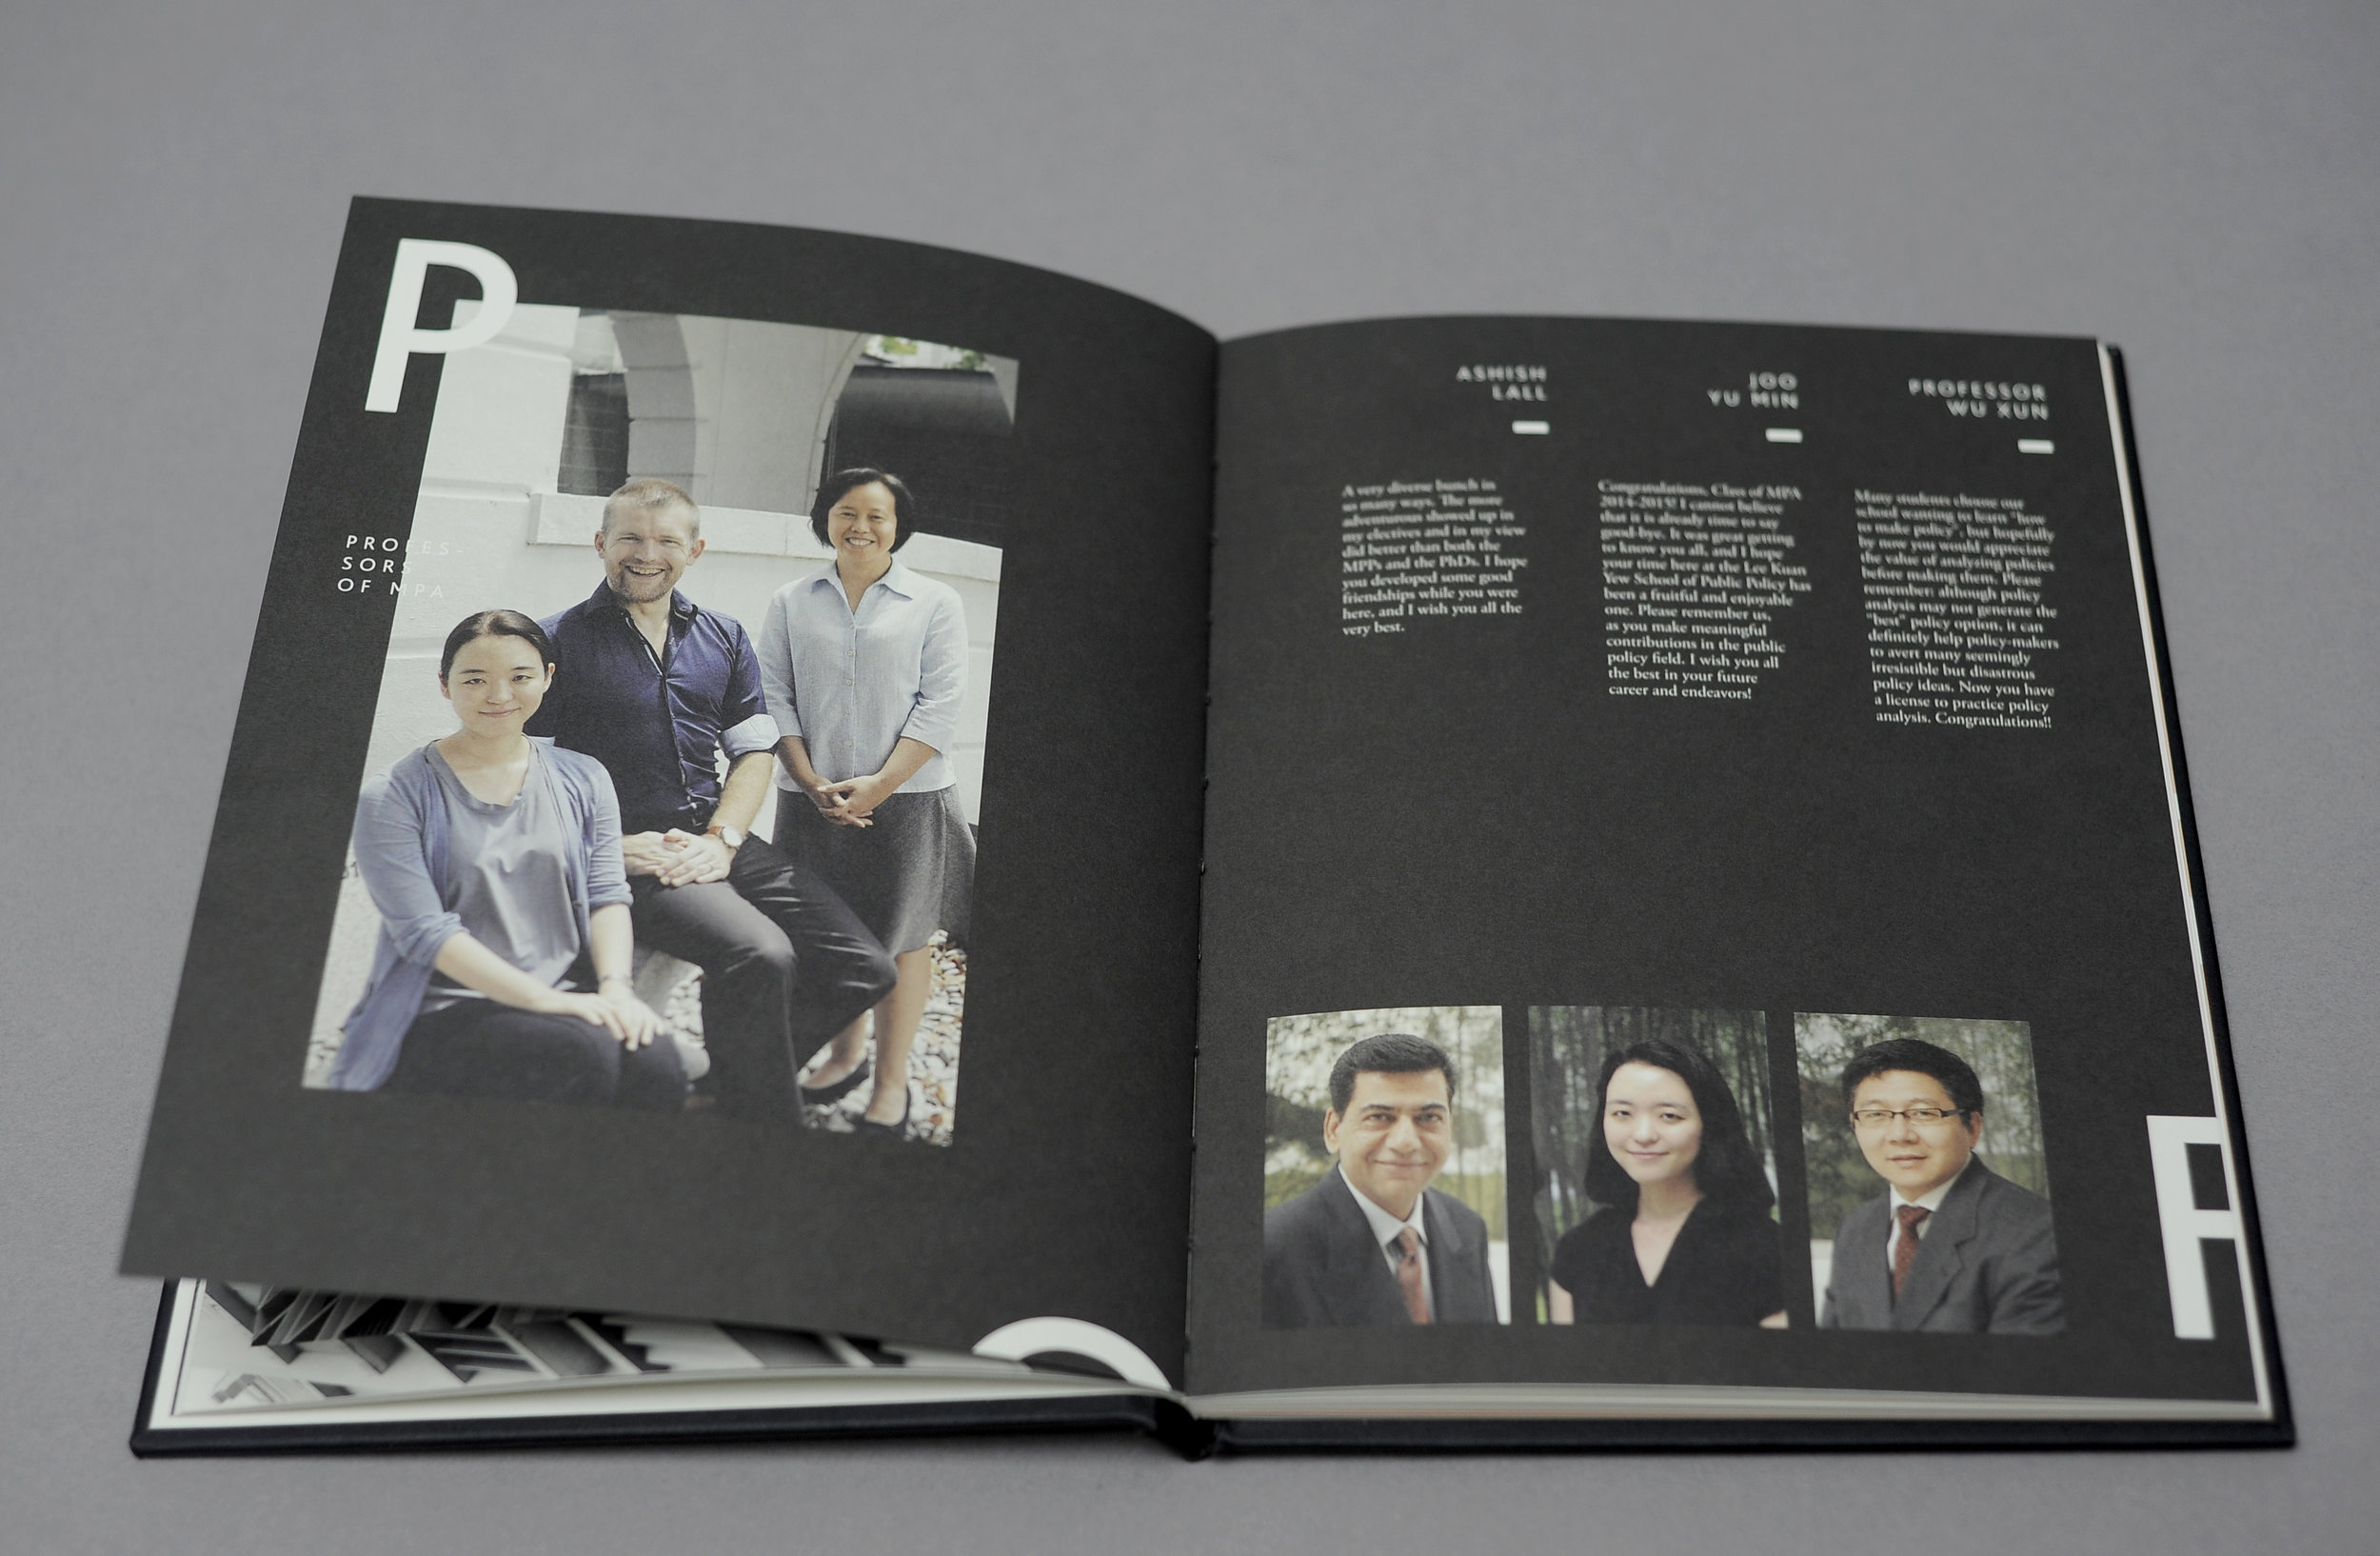 lee kuan yew school of public policy yearbook 9.jpg